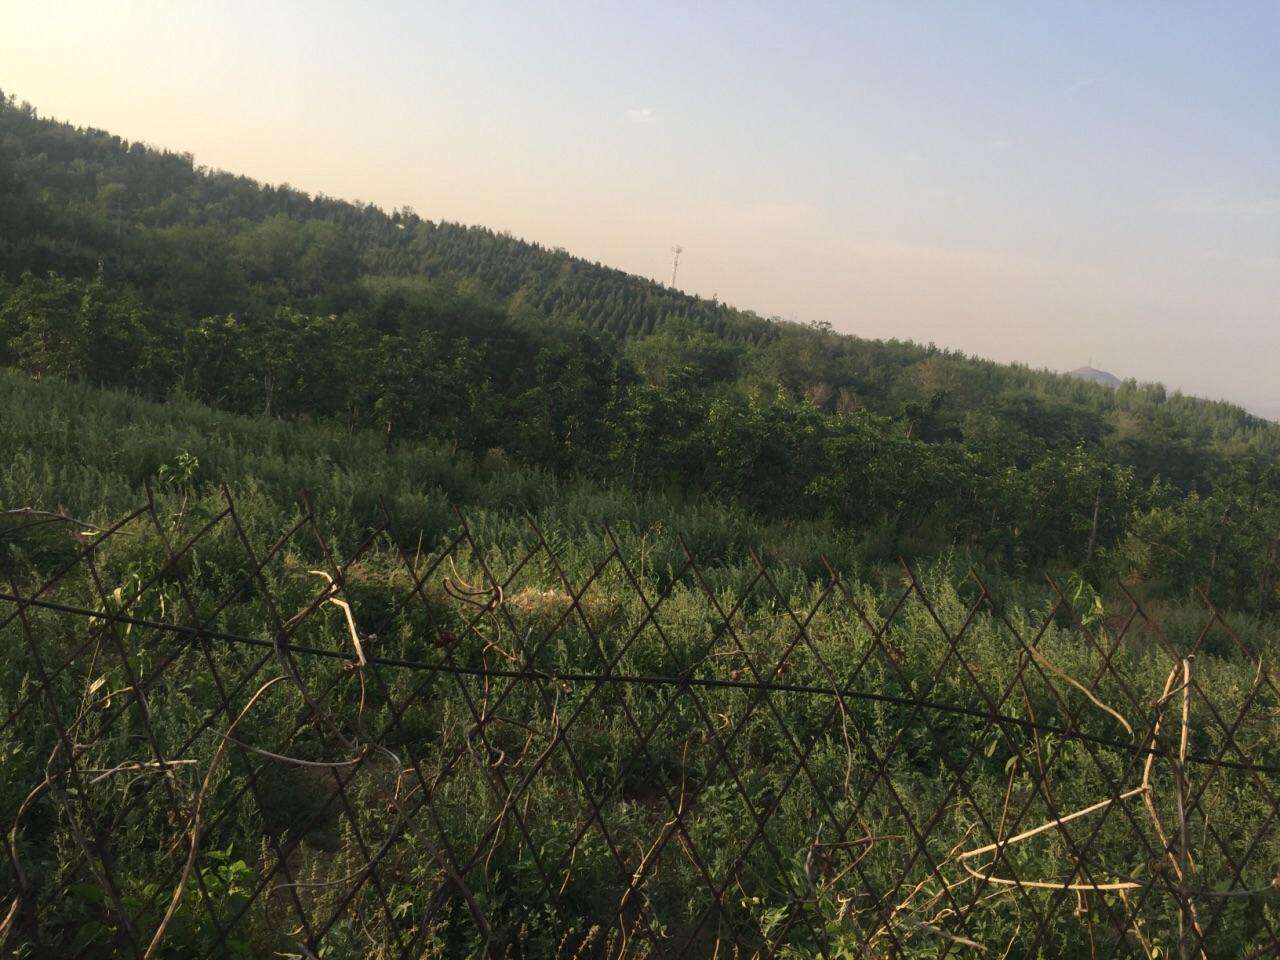 Yandong Ecological Park